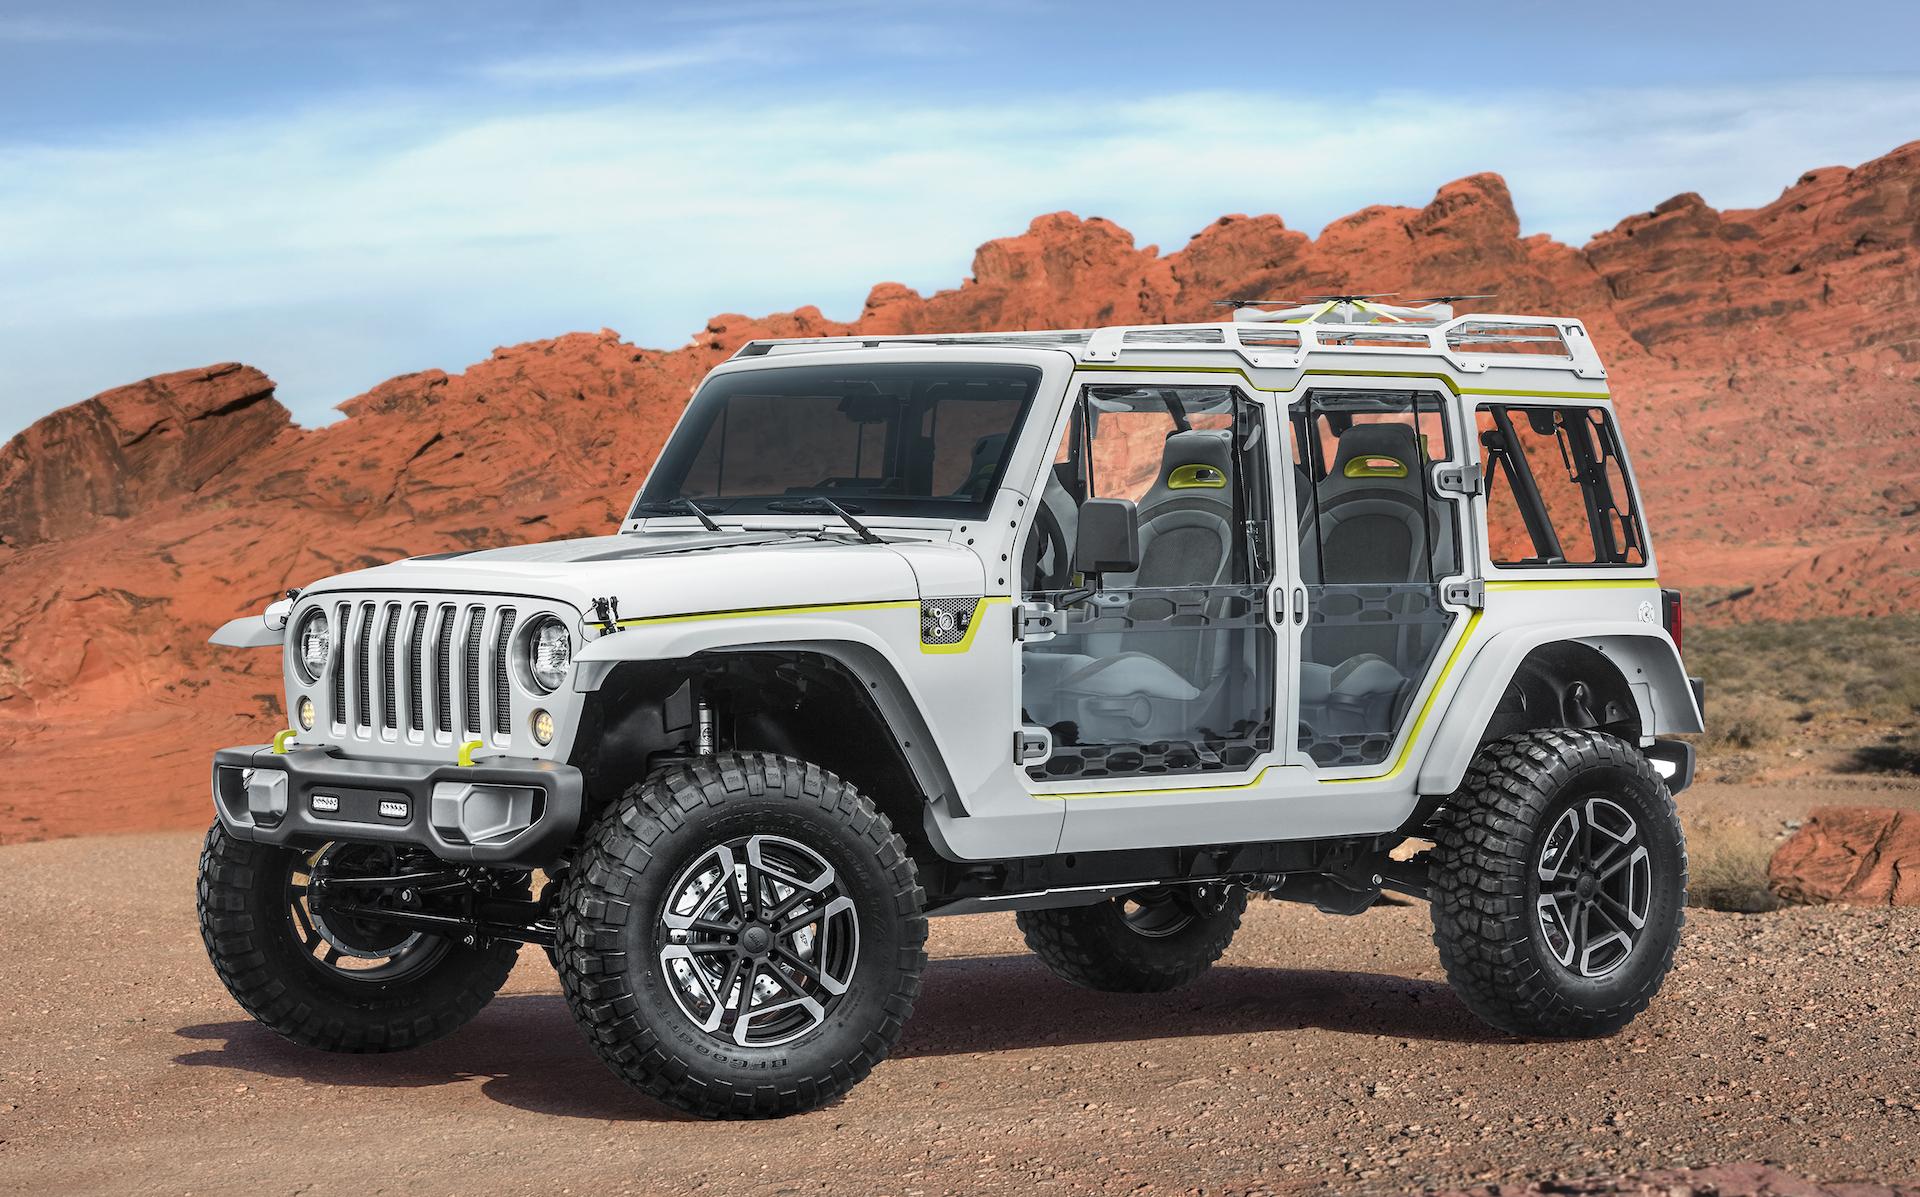 easter jeep safari concepts ford ranger production jaguar e type restoration car news headlines. Black Bedroom Furniture Sets. Home Design Ideas